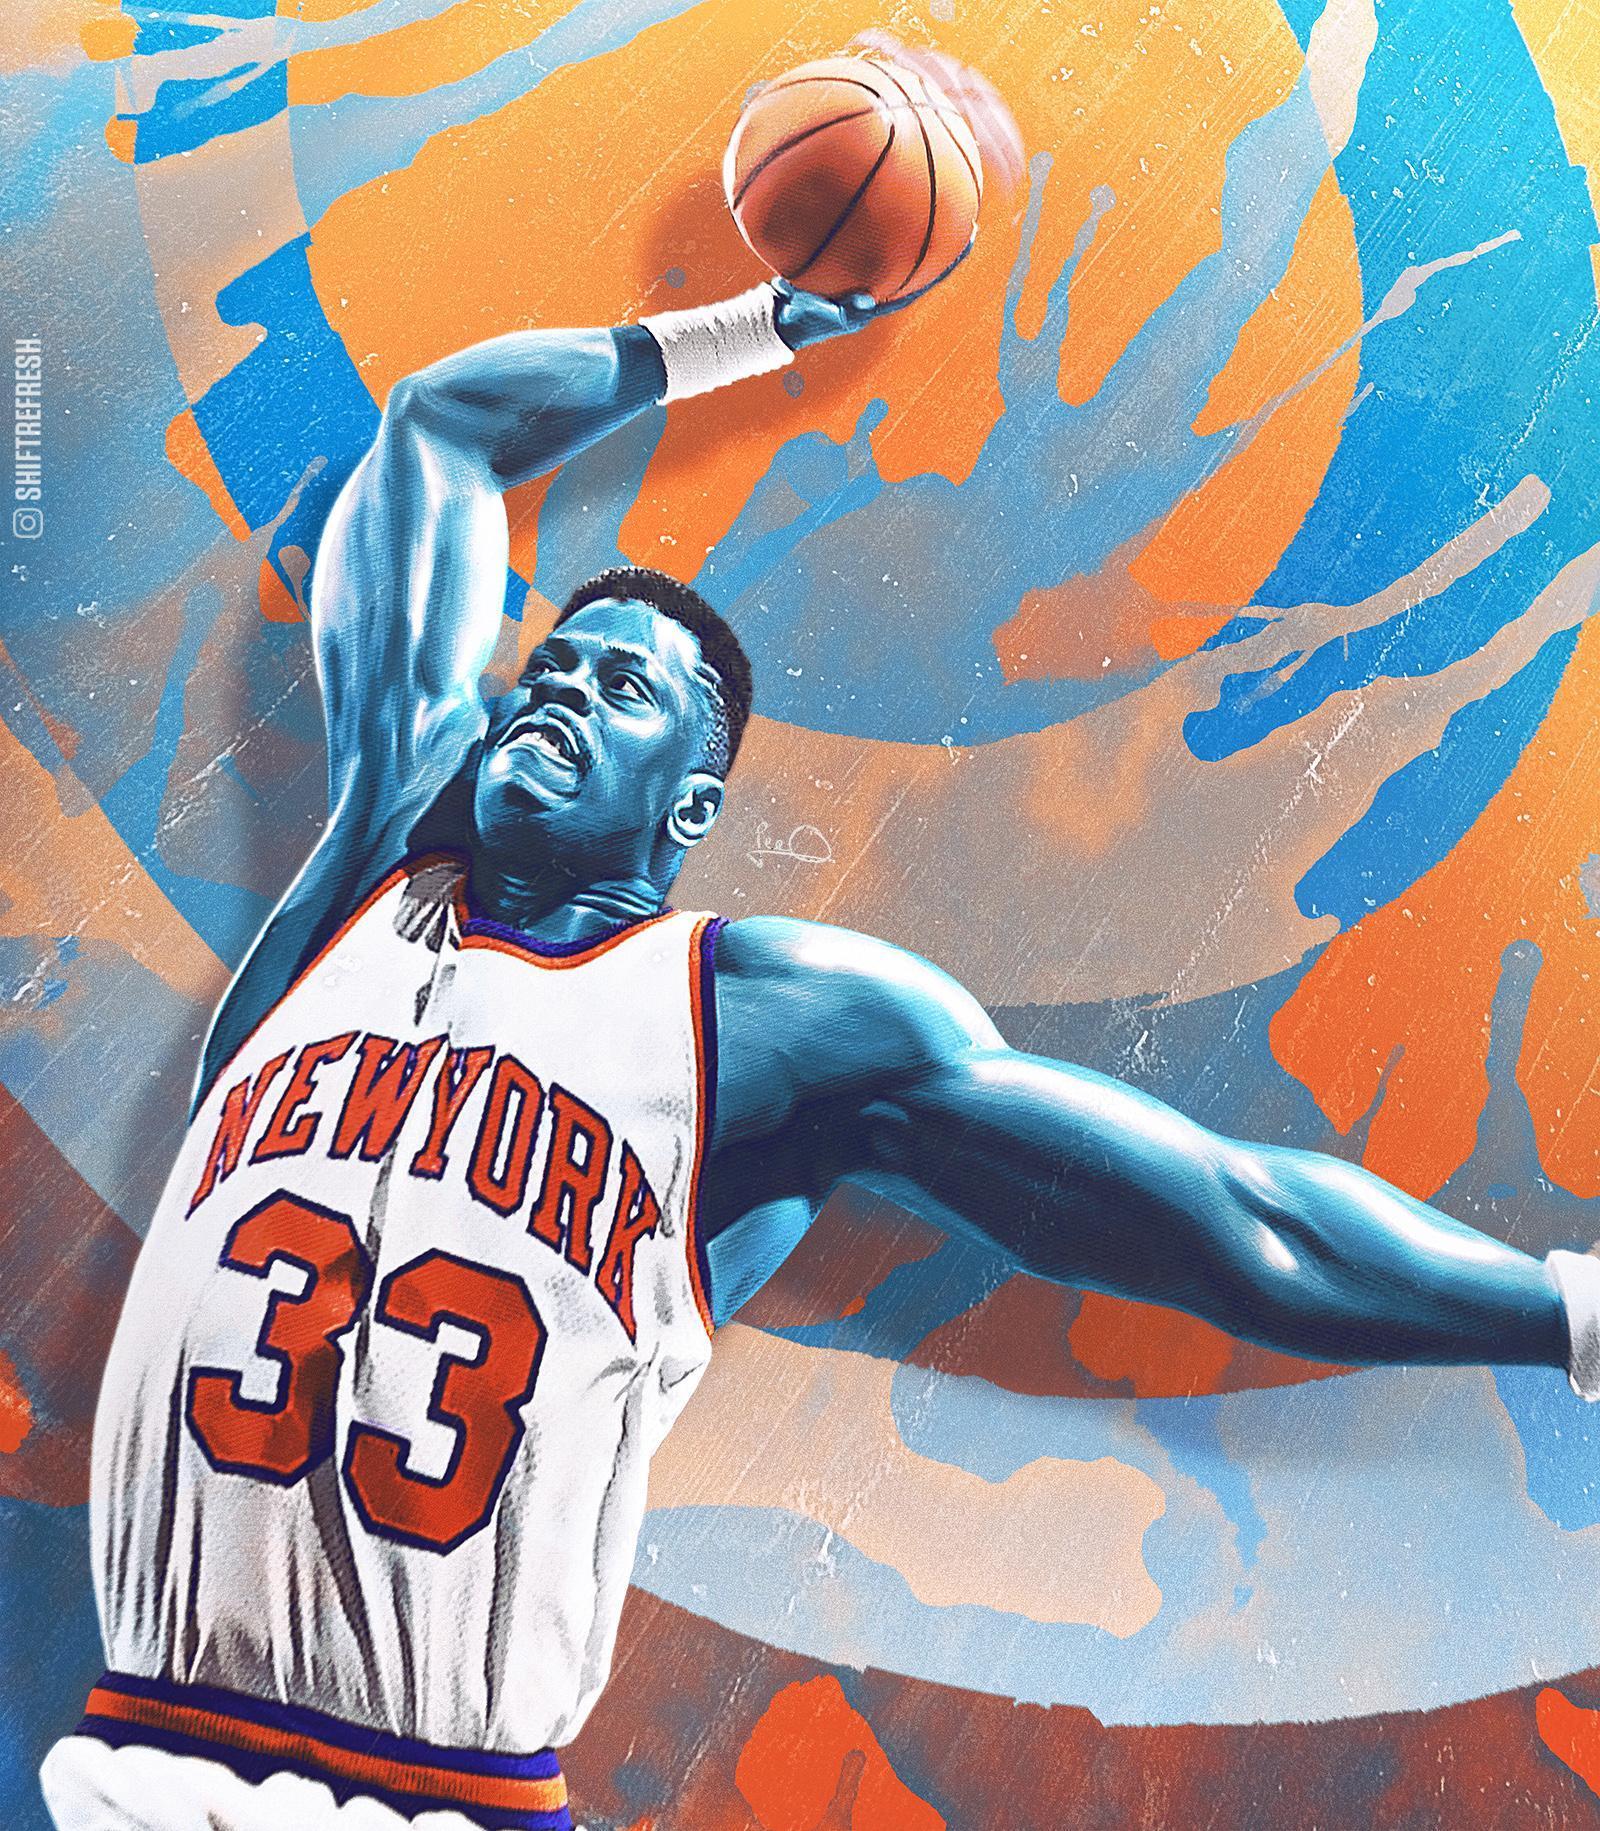 Patrick Ewing Wallpaper Graphics, Wallpaper, & Images for ... |Patrick Ewing Wallpaper